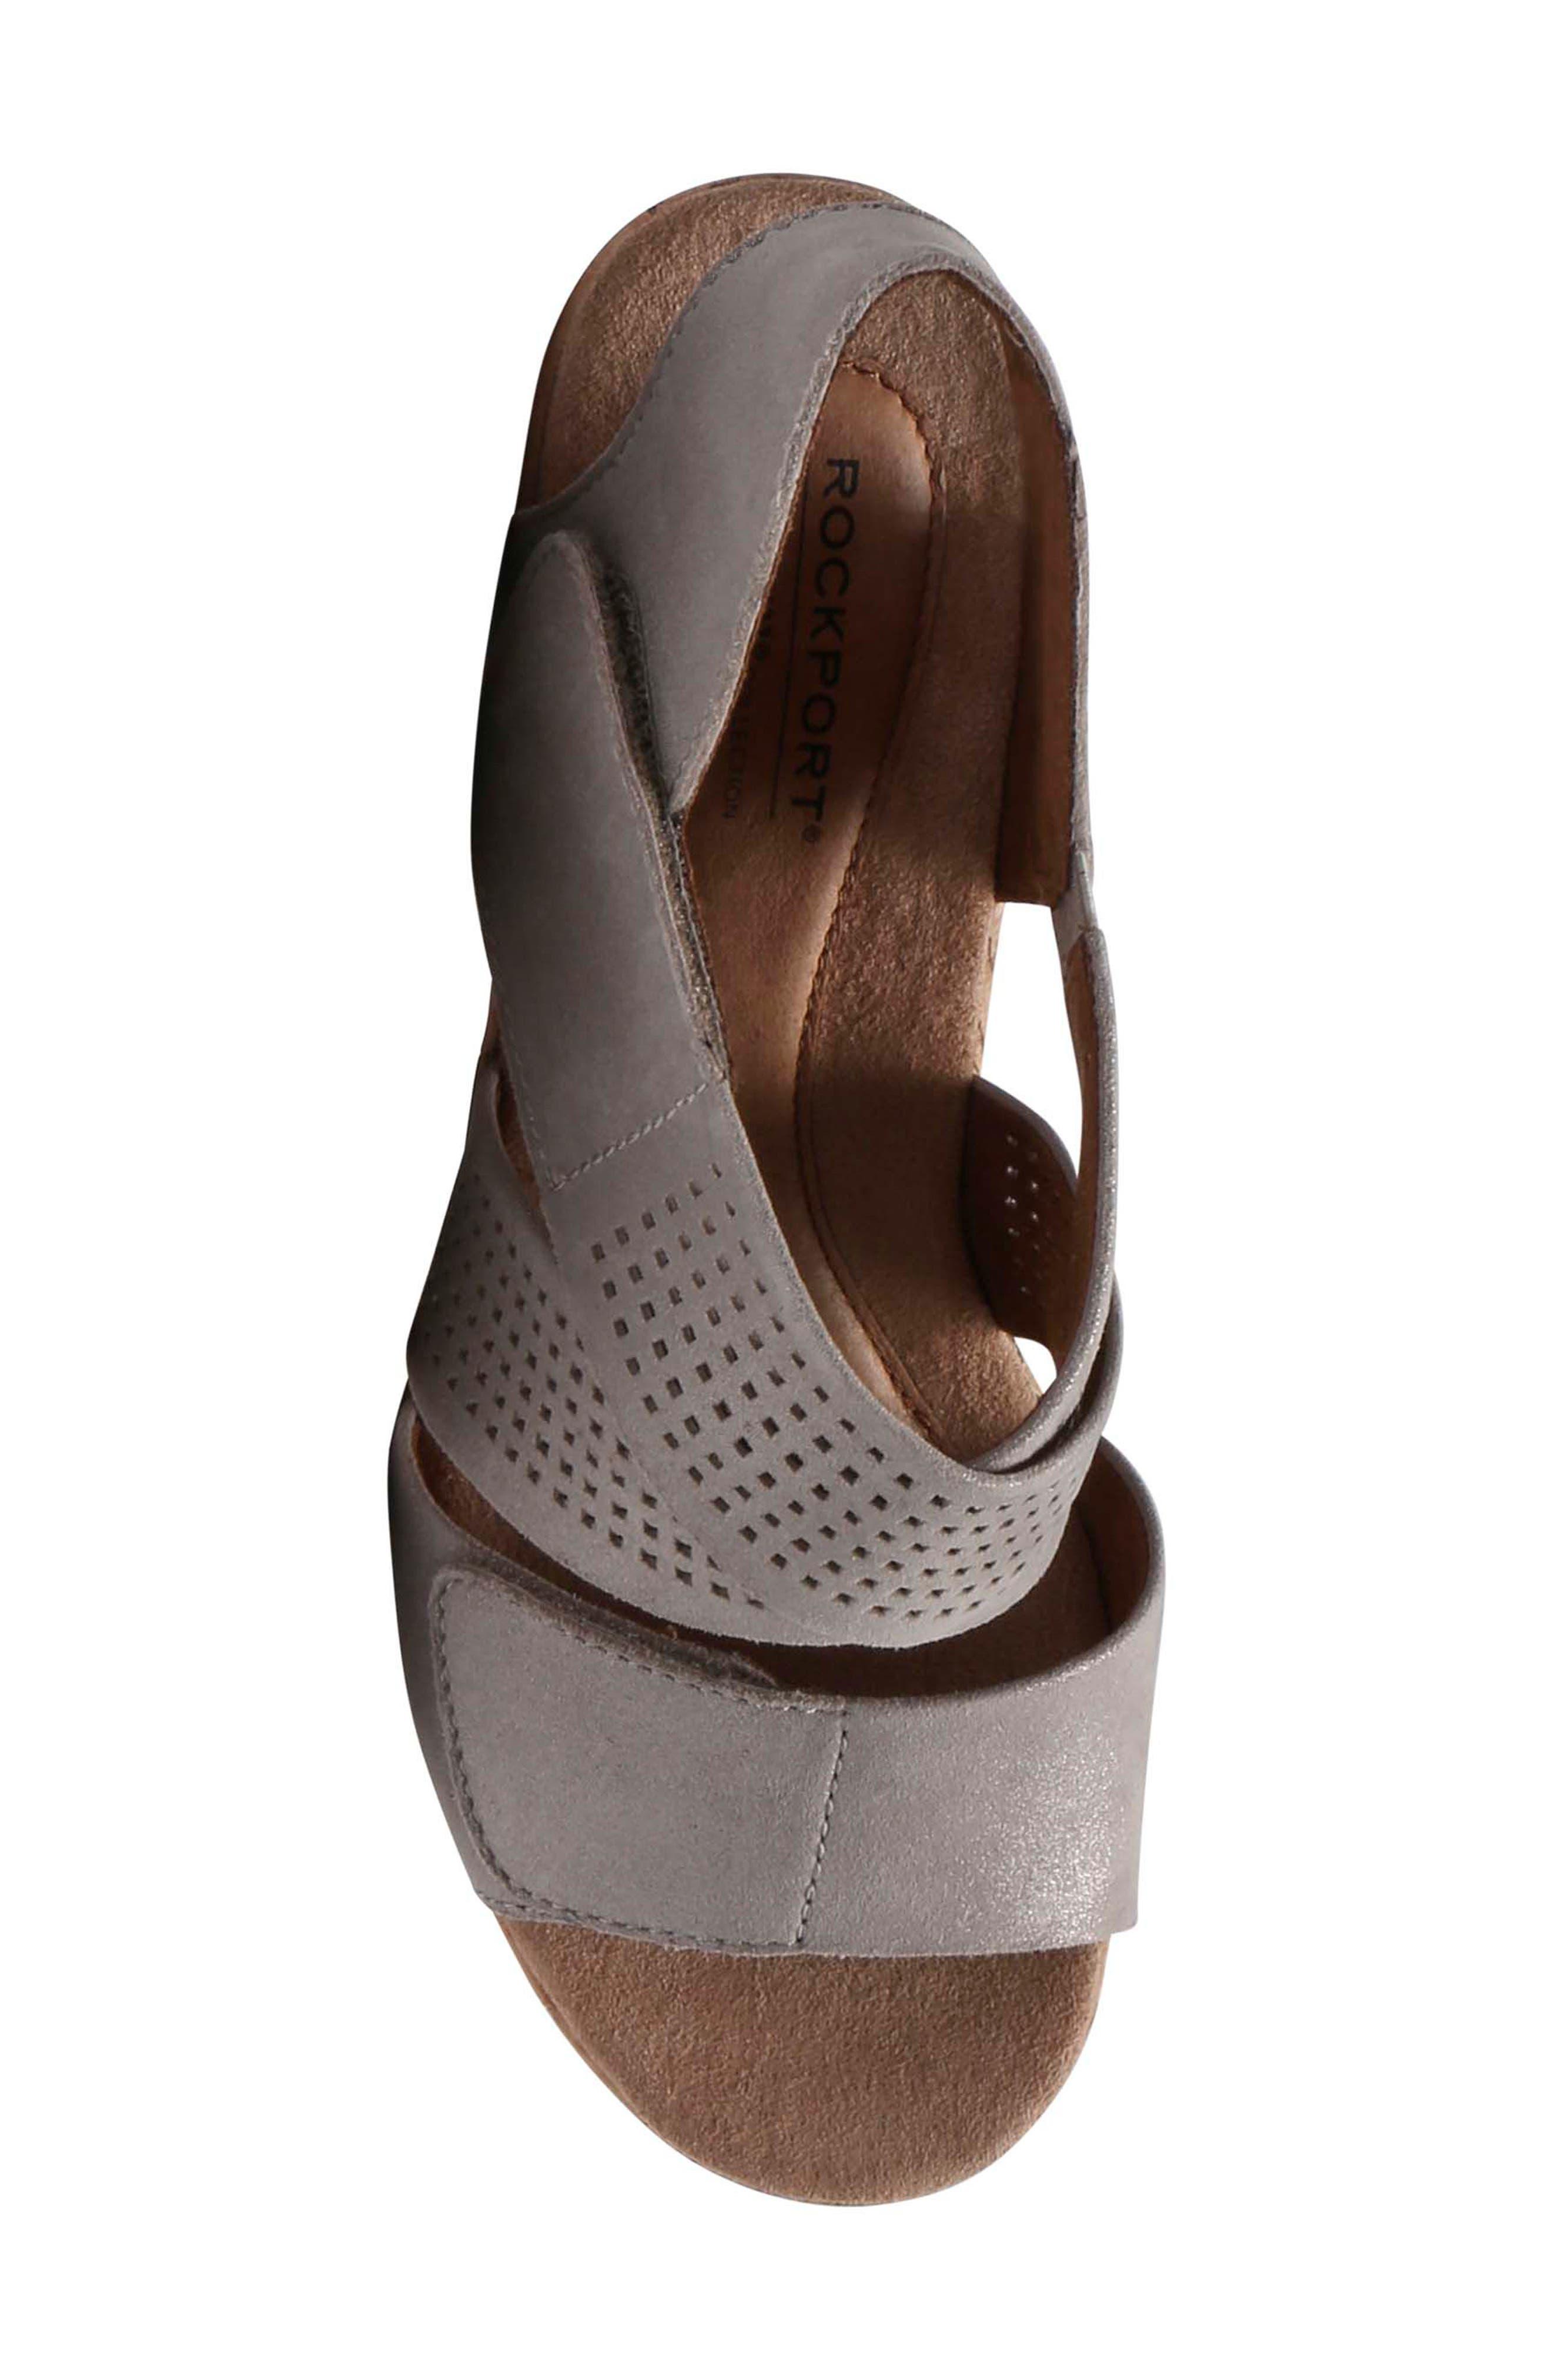 Janna Cross Strap Wedge Sandal,                             Alternate thumbnail 23, color,